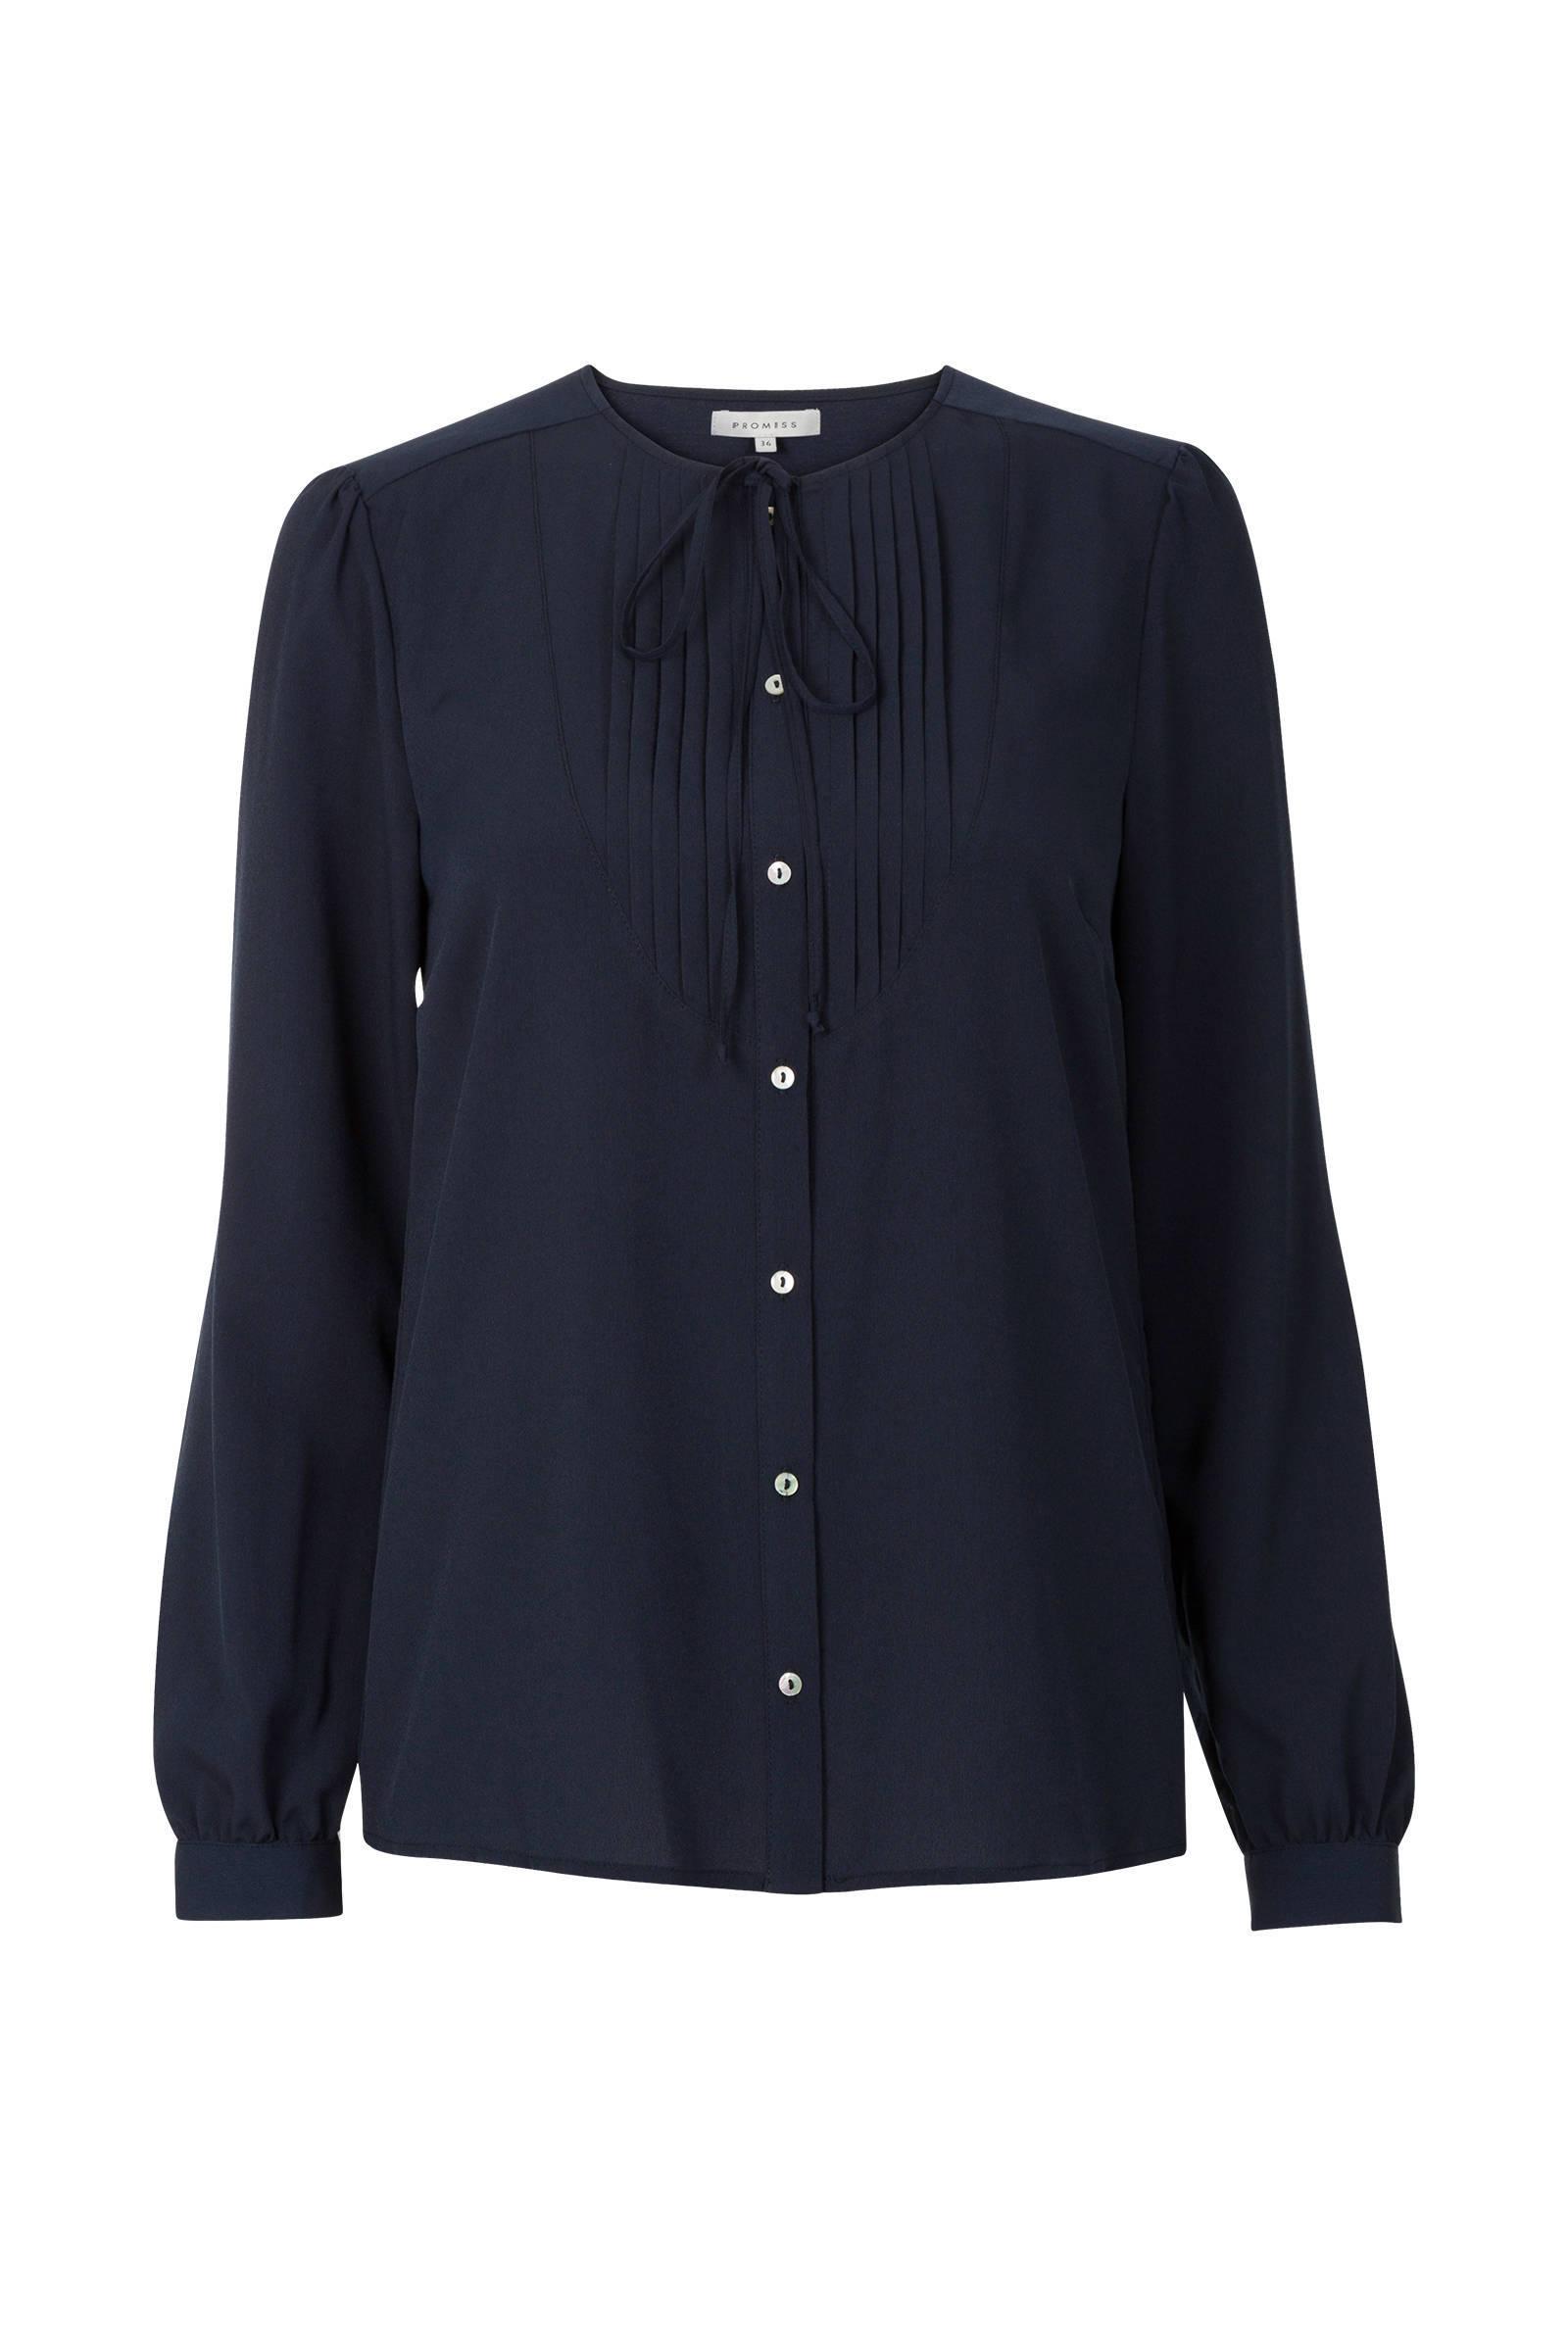 blauwe blouse met strik